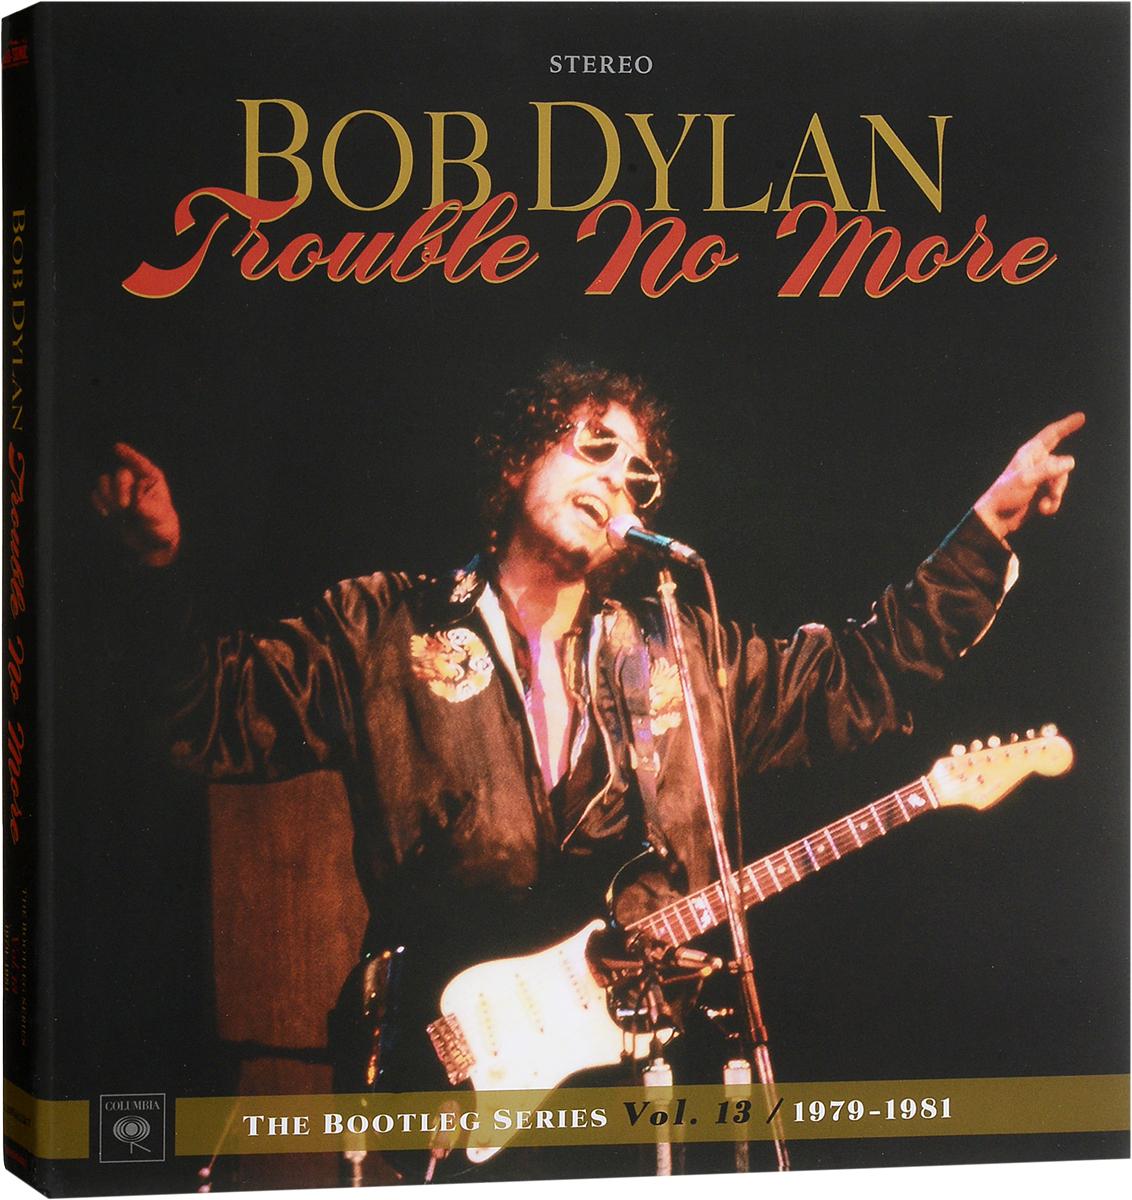 цена на Боб Дилан Bob Dylan. Trouble No More: The Bootleg Series Vol. 13 / 1979-1981 (4 LP + 2 CD)